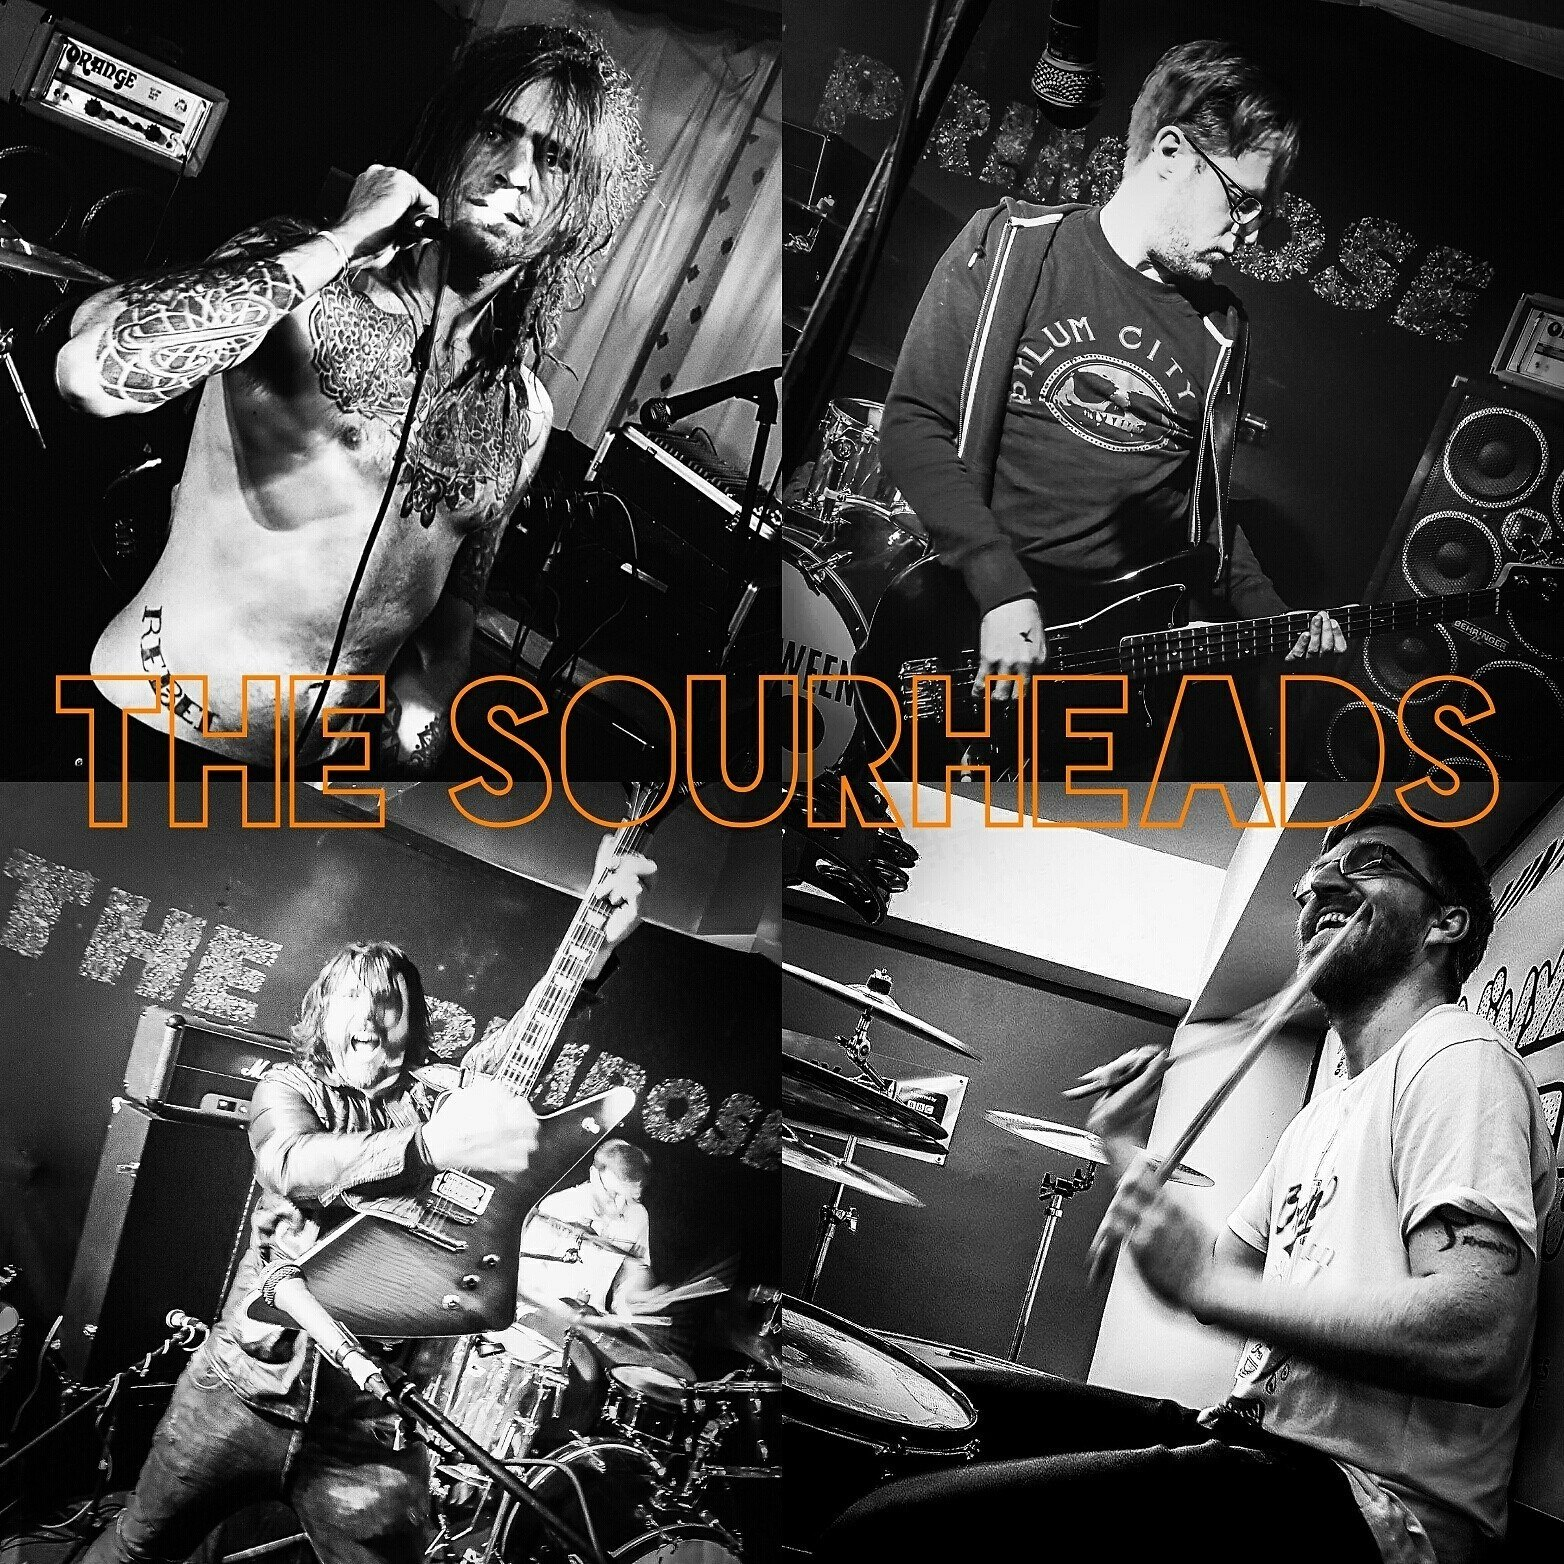 sourheads.jpg